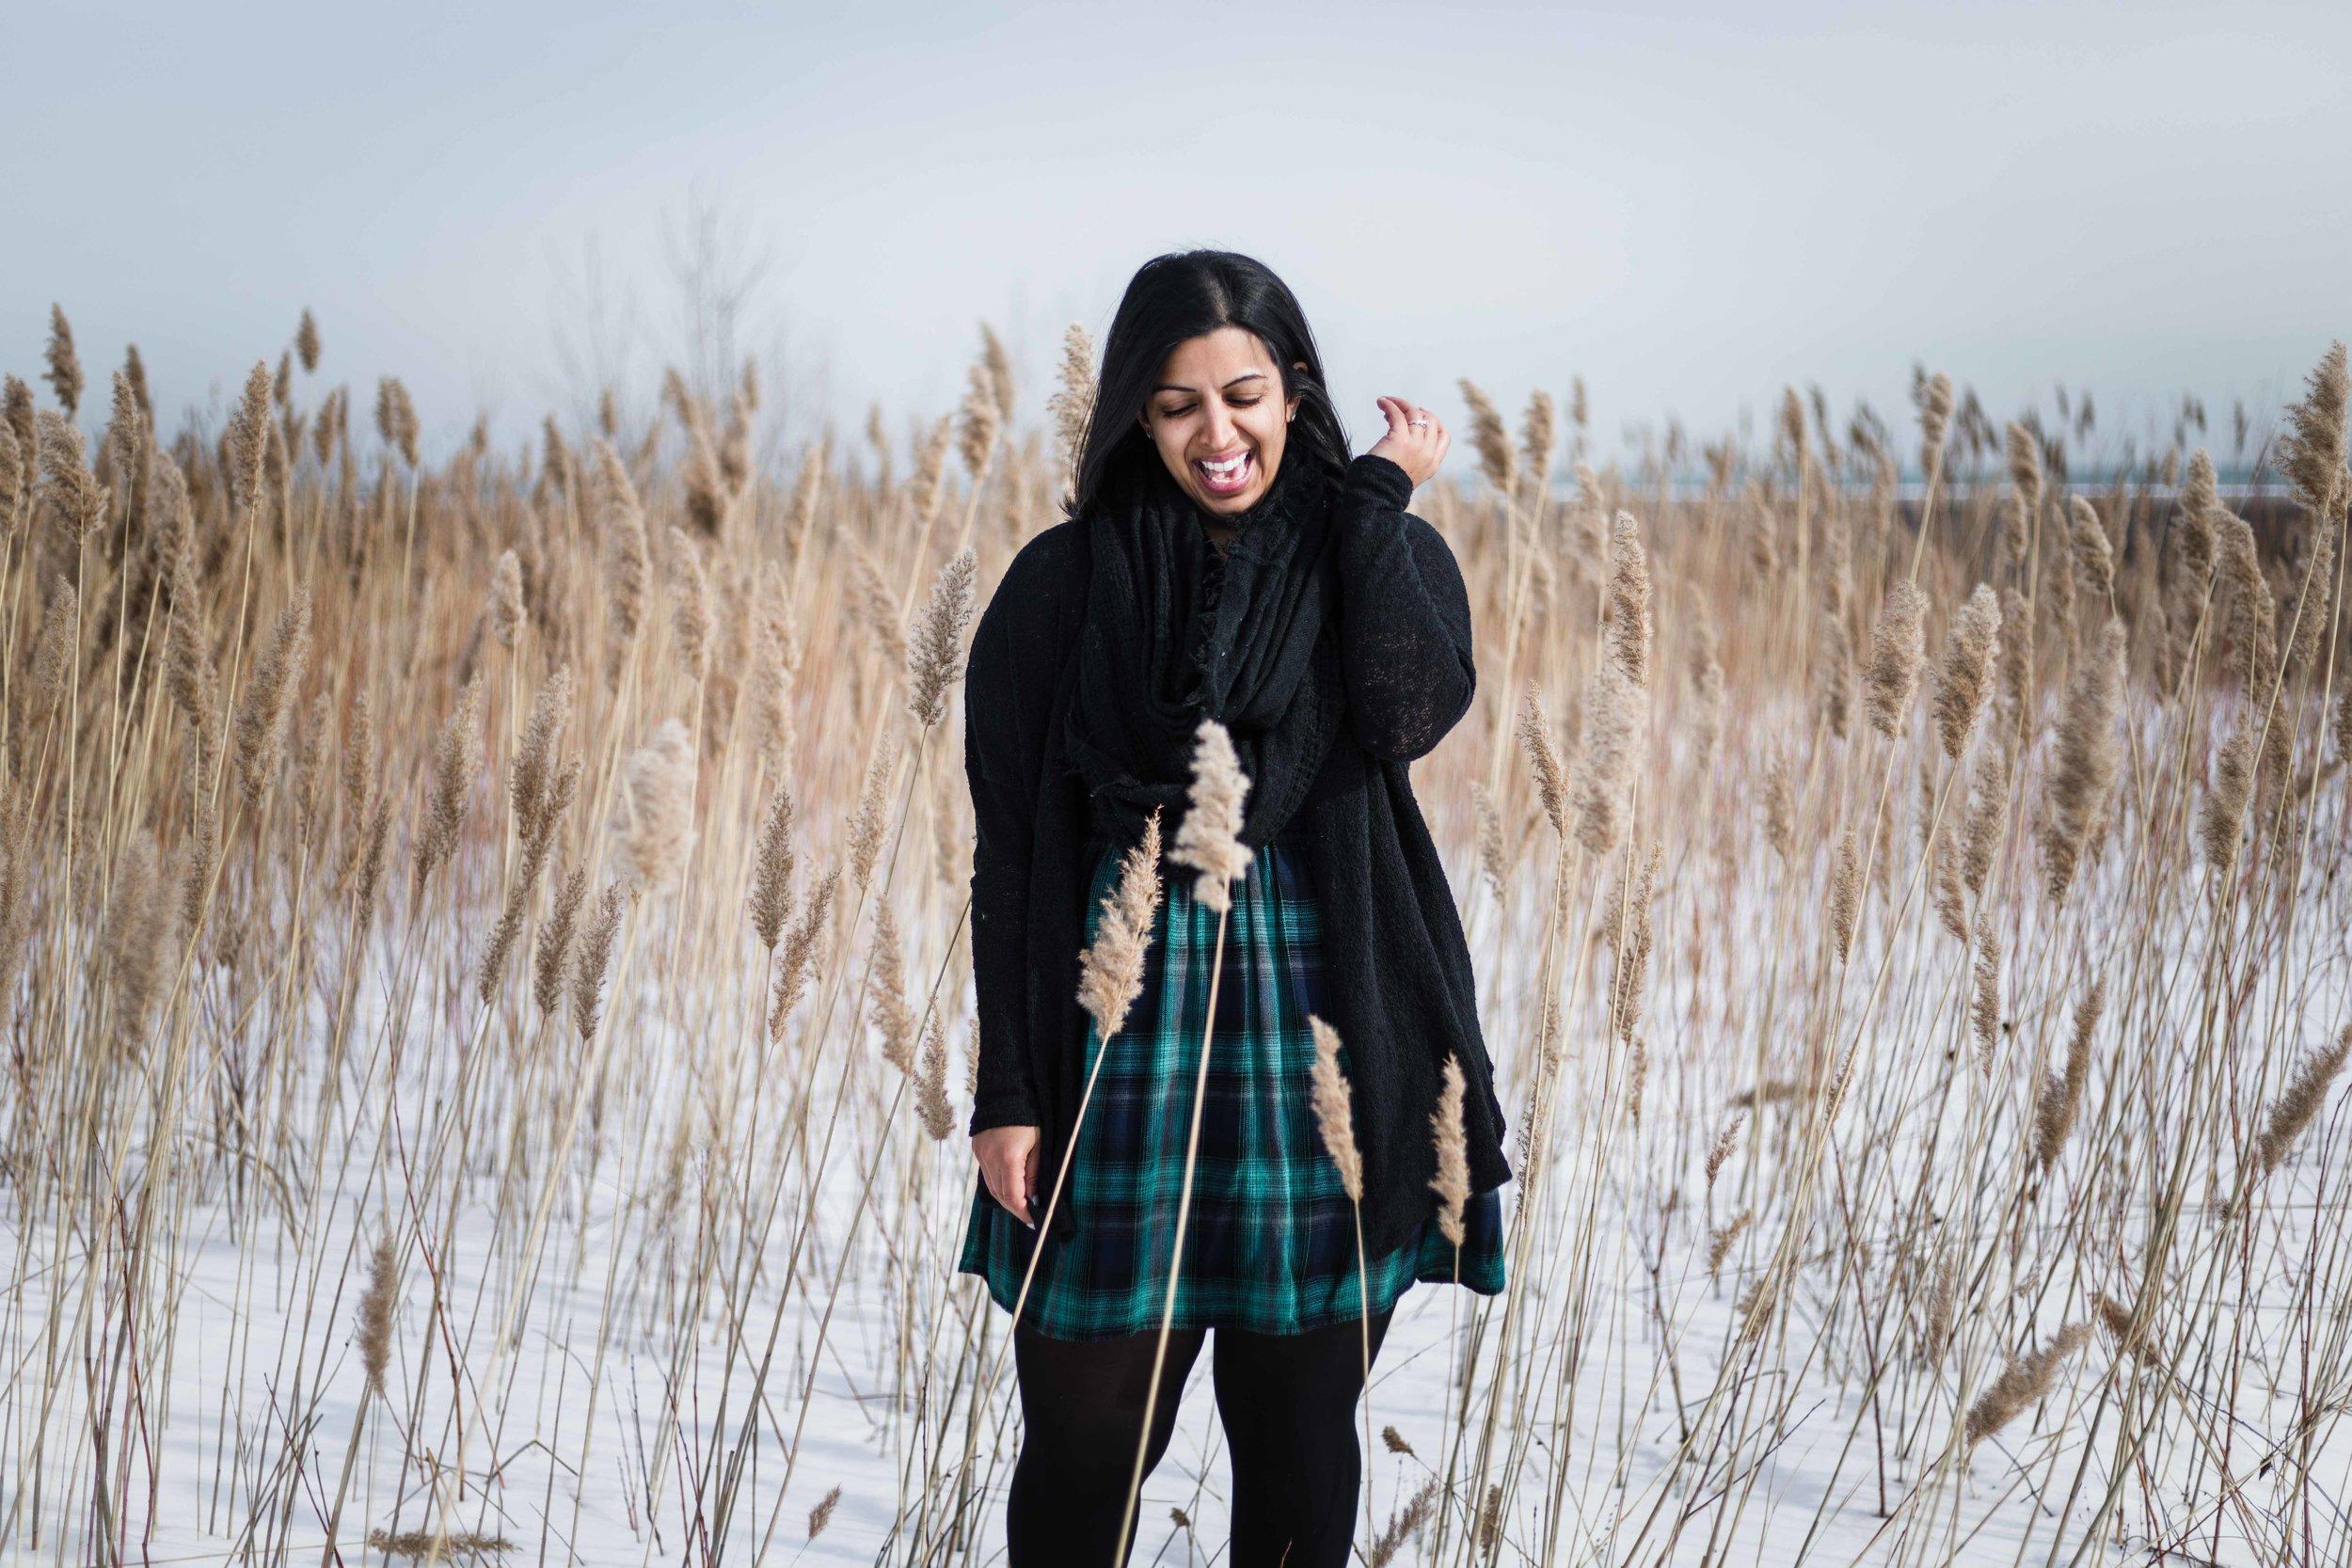 Chicago headshot and branding photographer interviews Maya of Preoccupied Bride in Evanston